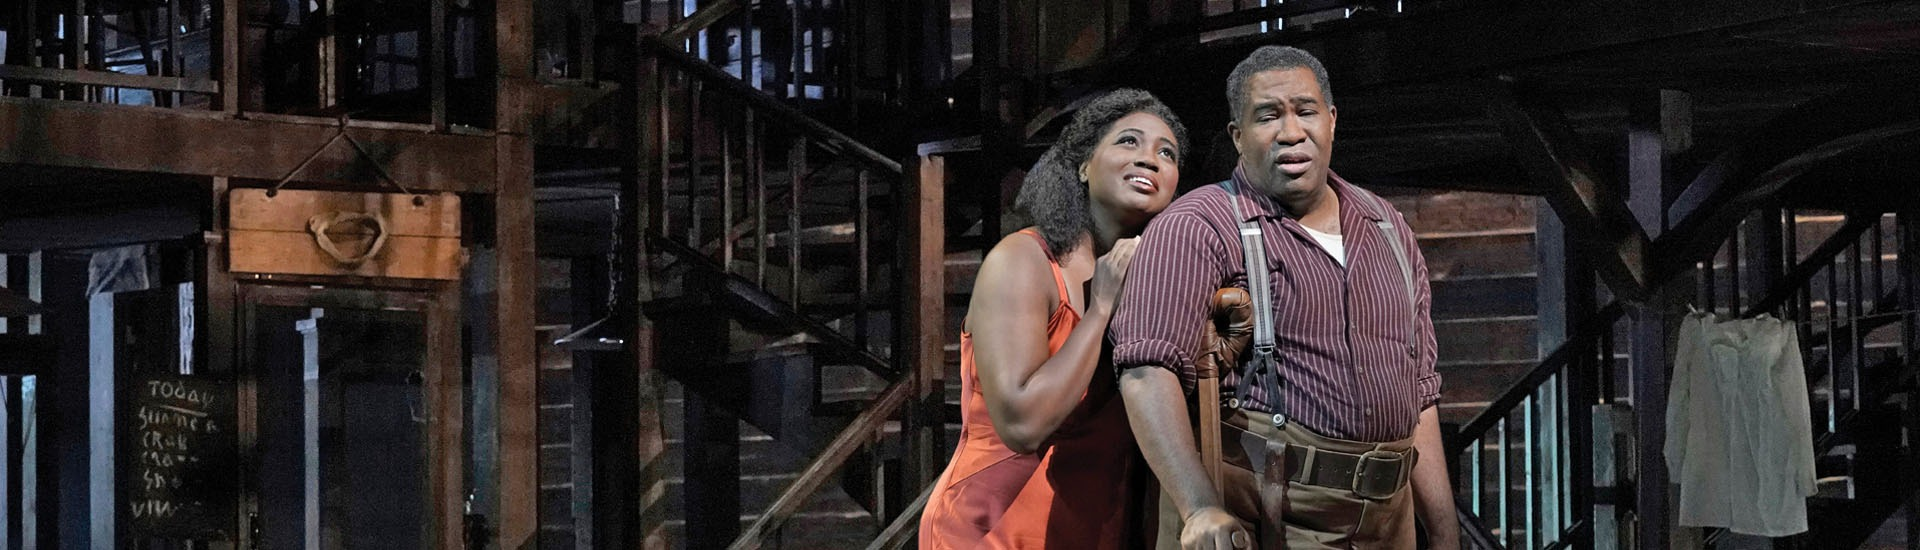 The Met: Live in HD Summer Encores